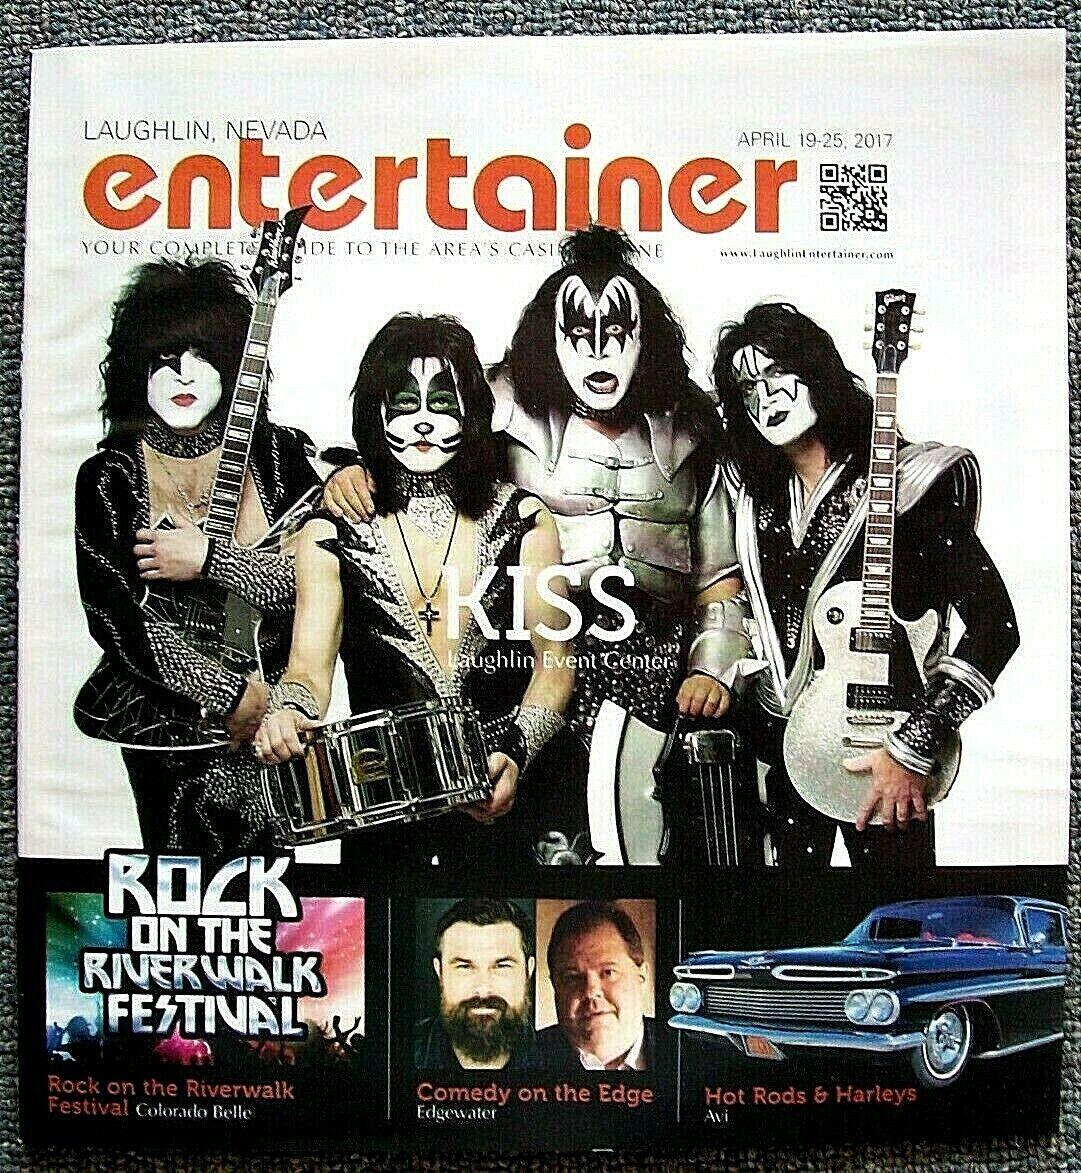 KISS Gene Simmons Rare ENTERTAINER MAGAZINE Laughlin NEVADA April 2017 Last One  - $7.95